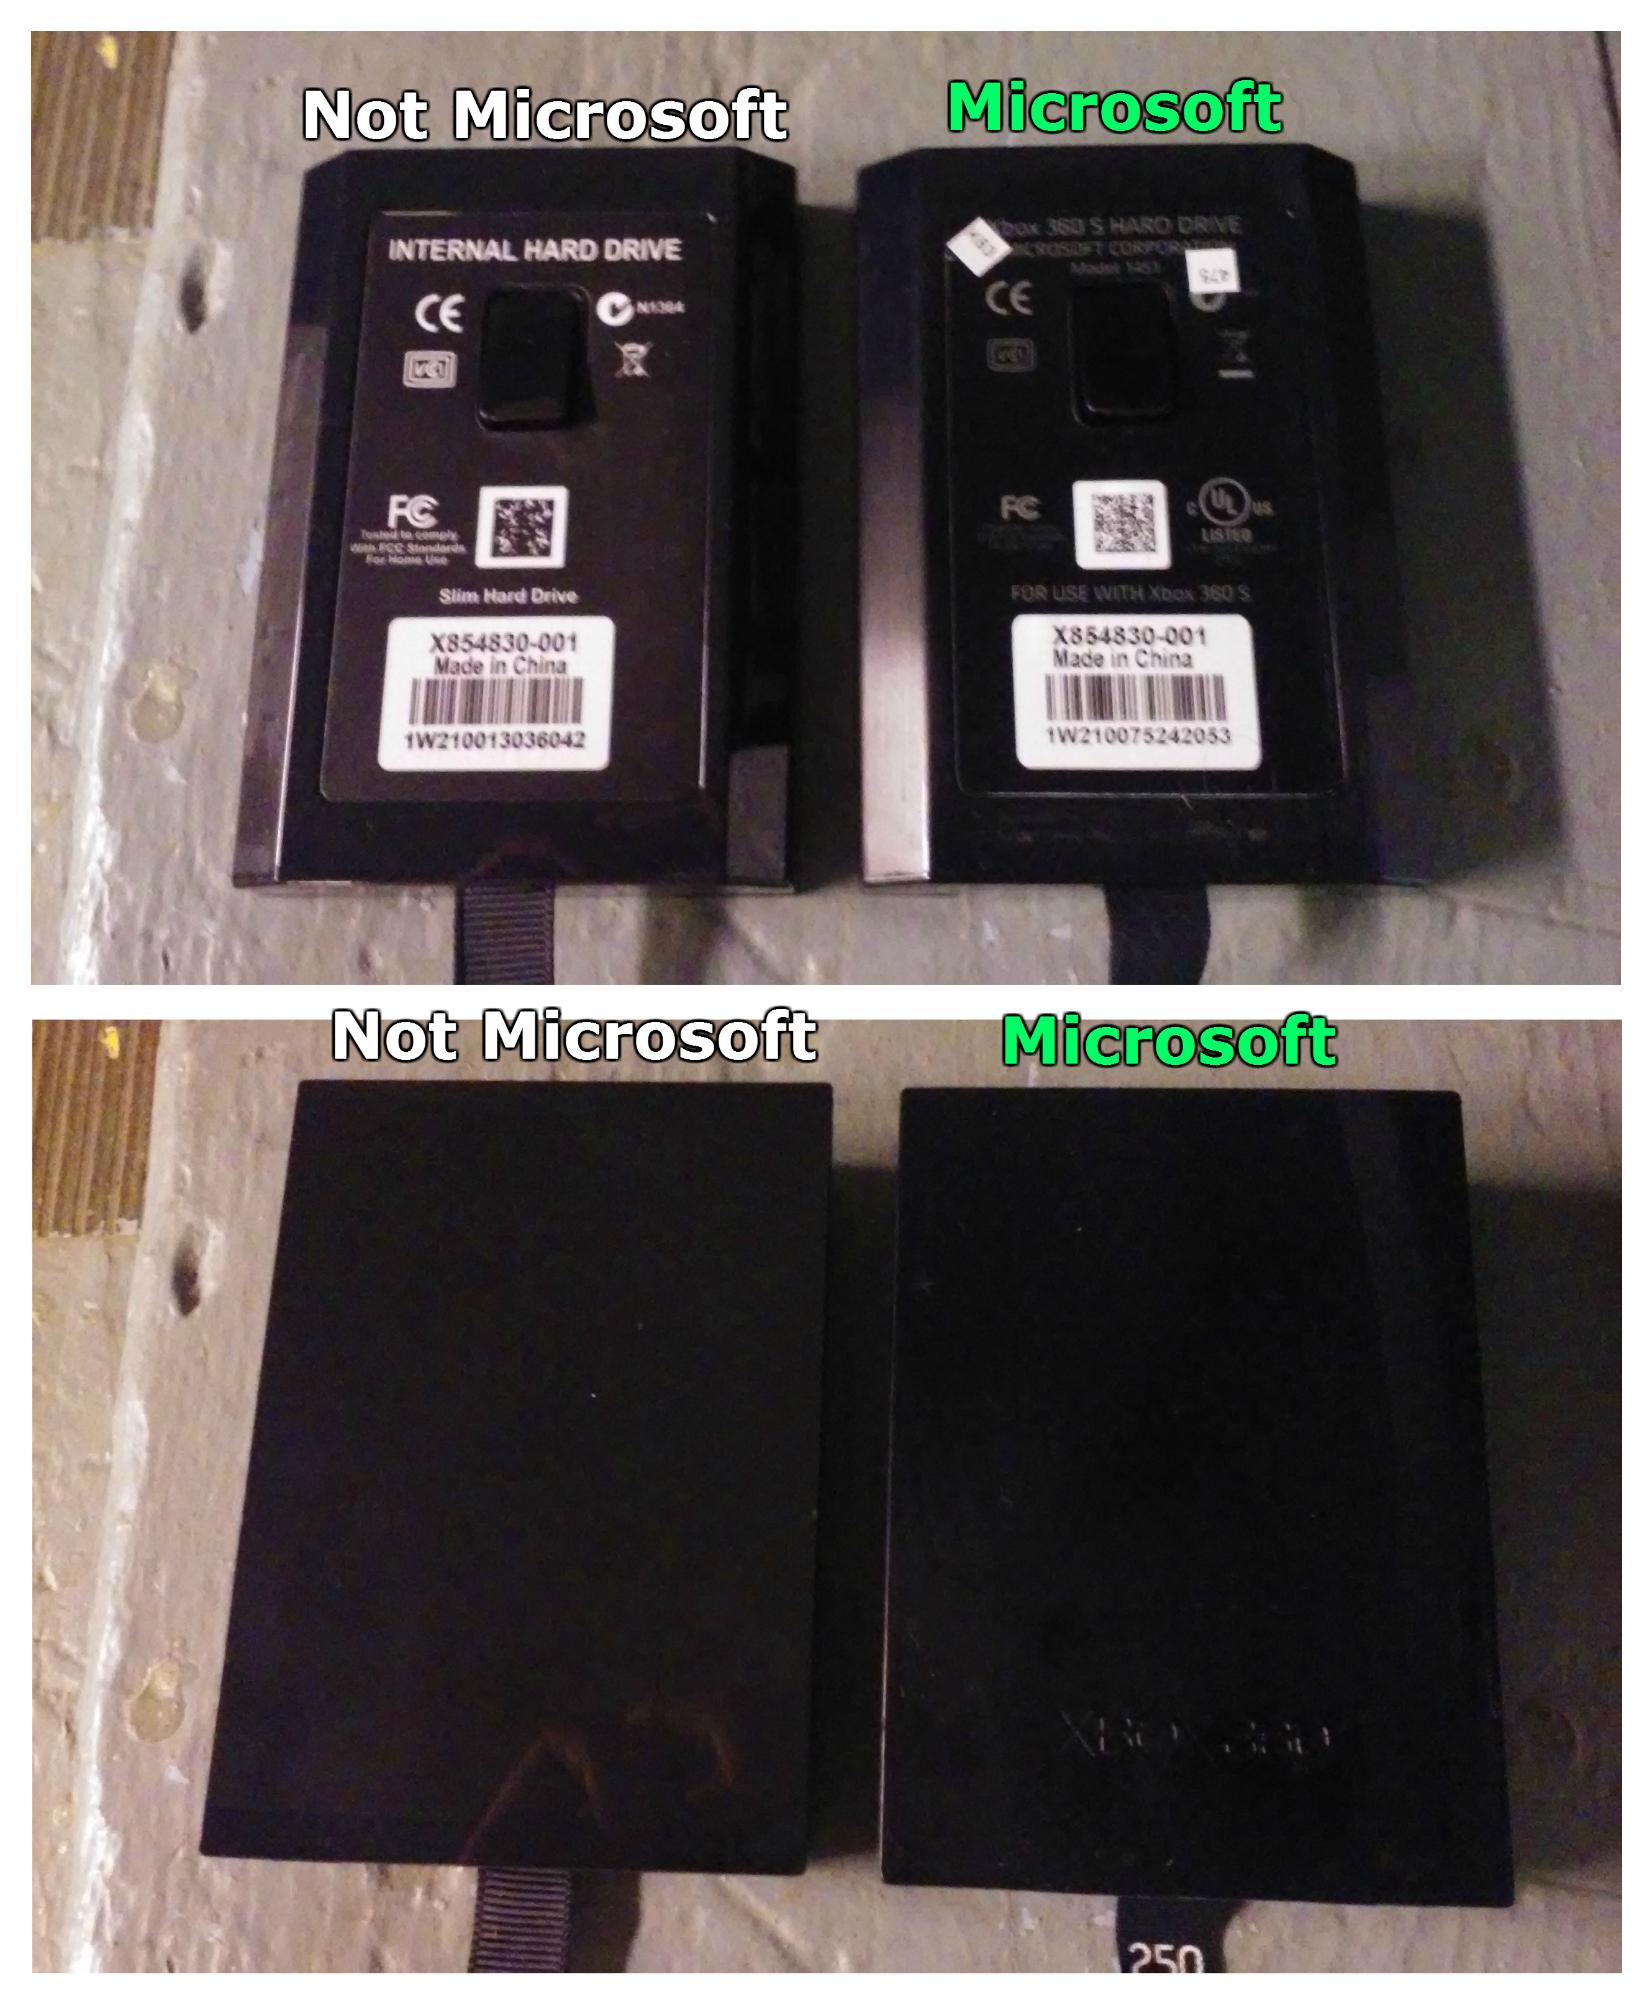 Microoft vs Non-Microsoft Xbox 360 internal hard drives